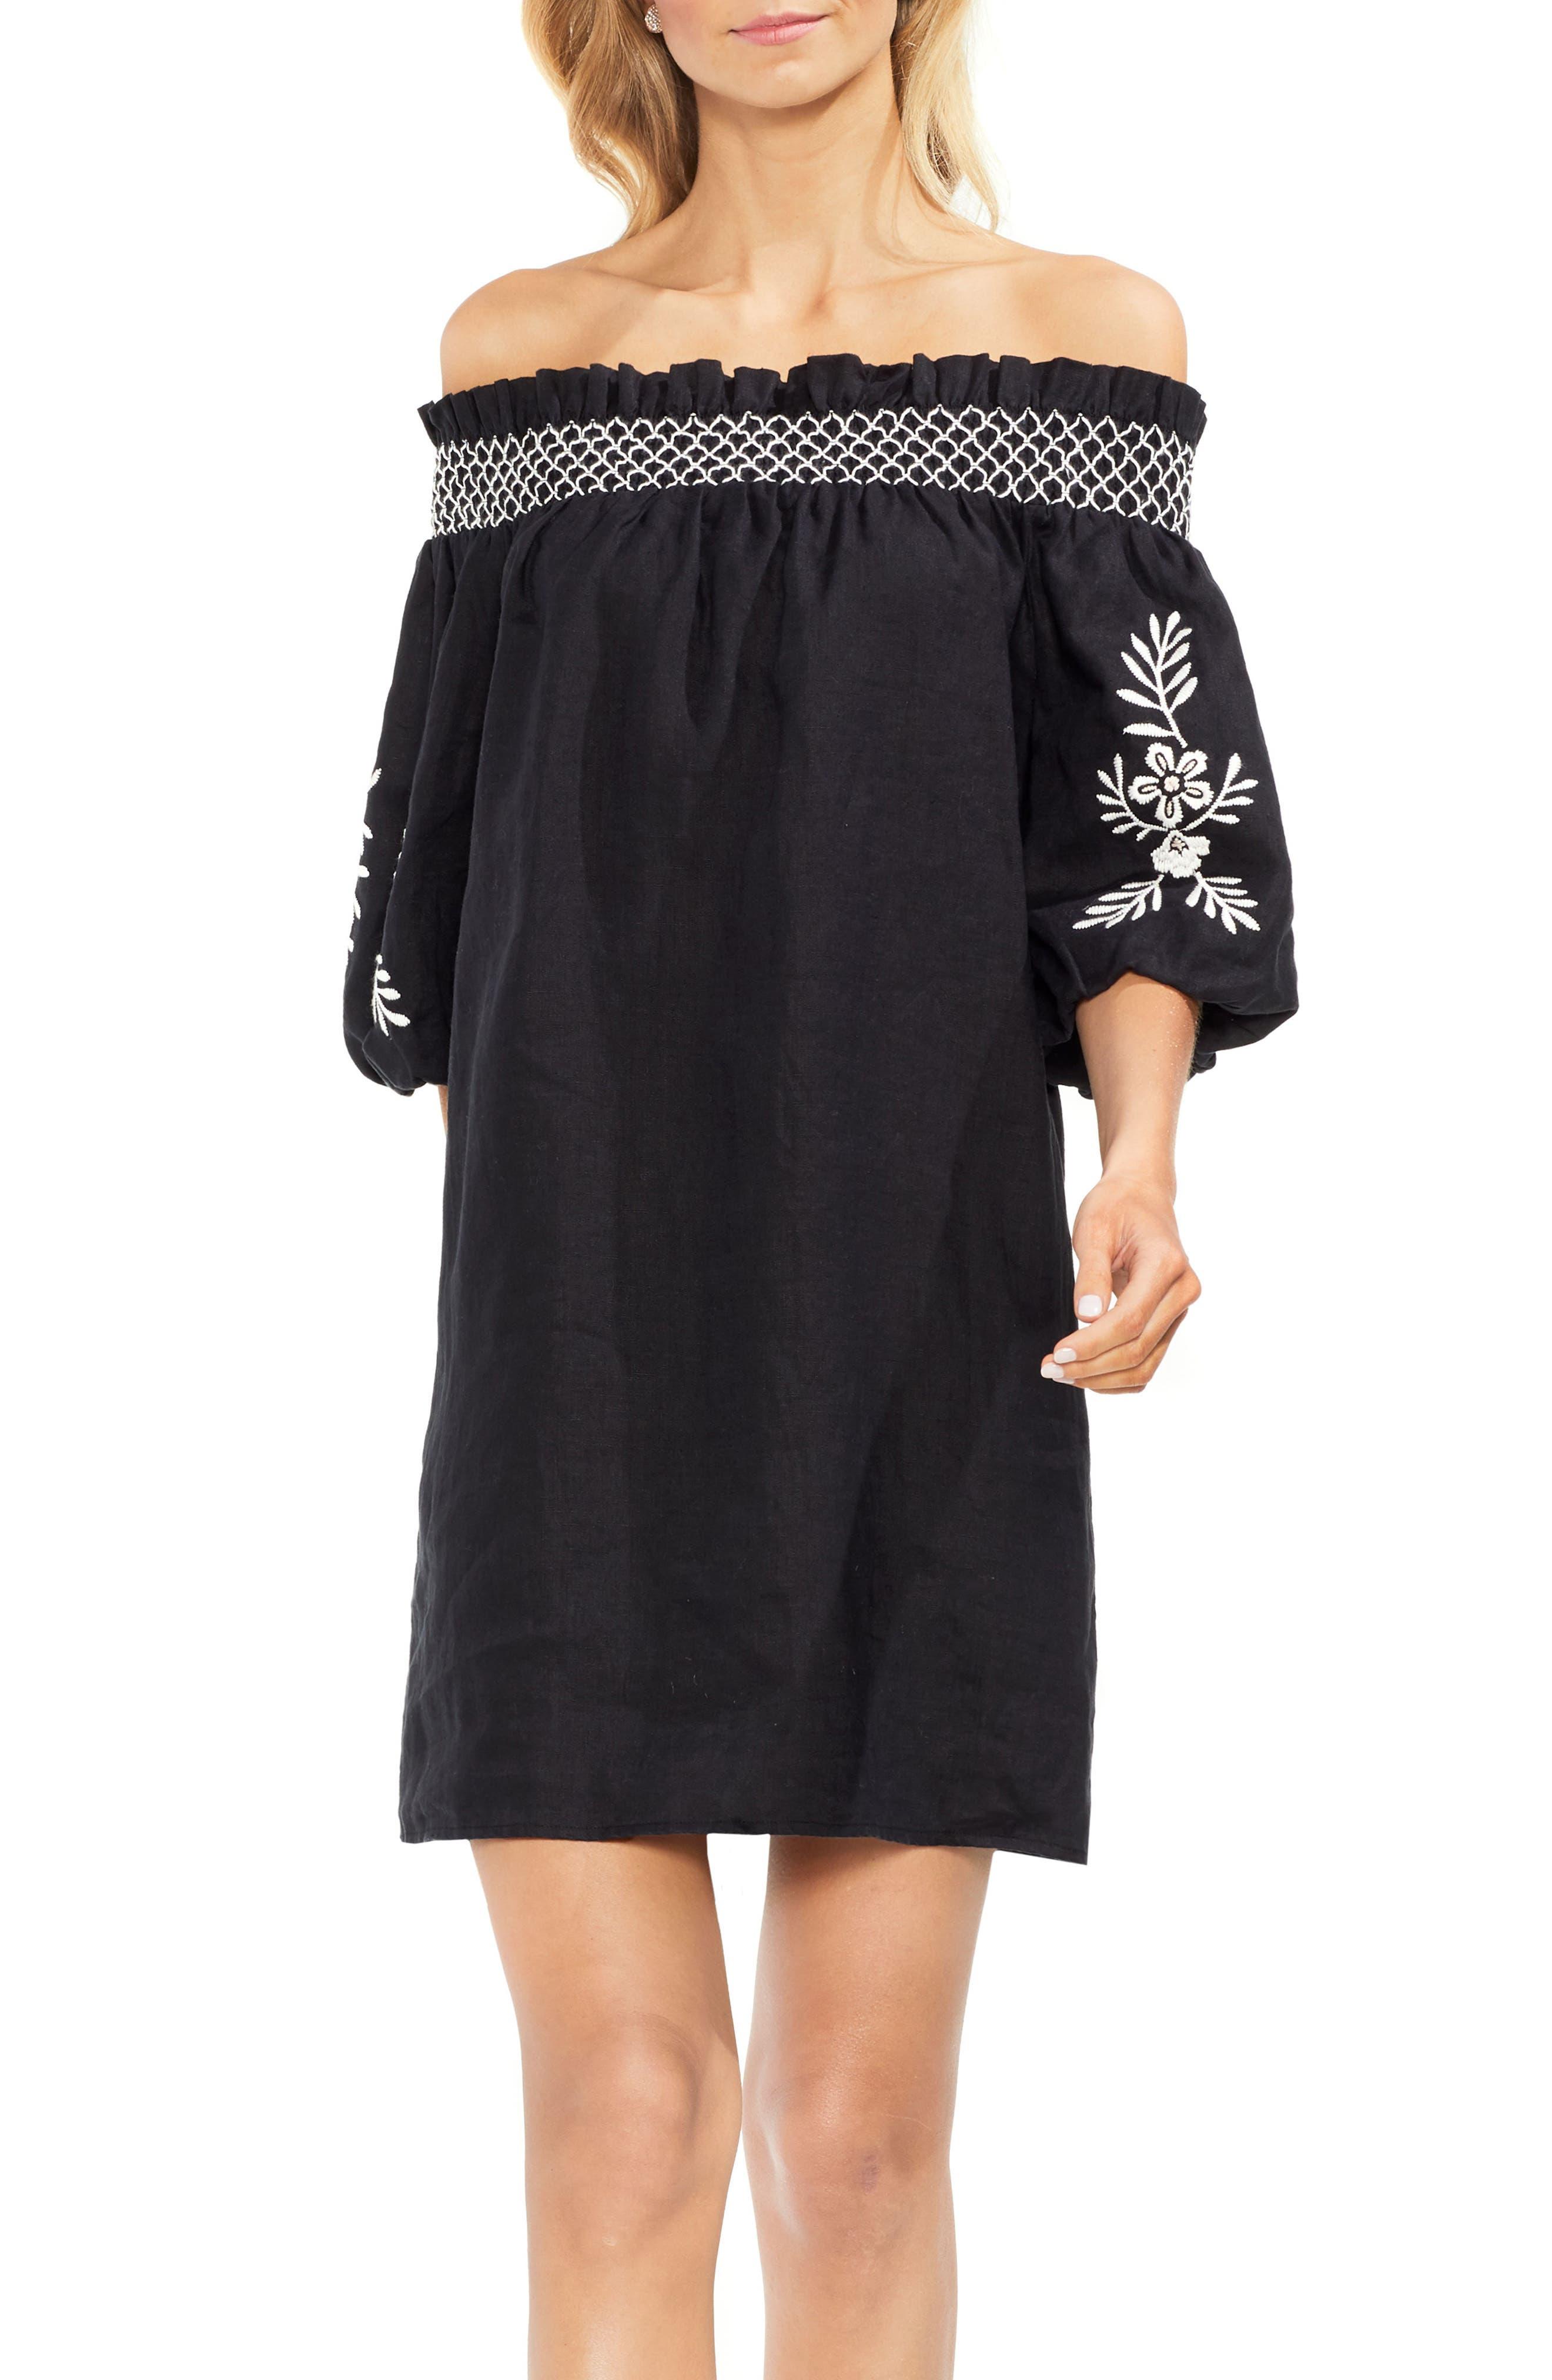 2986ea0a464 VINCE CAMUTO OFF THE SHOULDER LINEN SHIFT DRESS